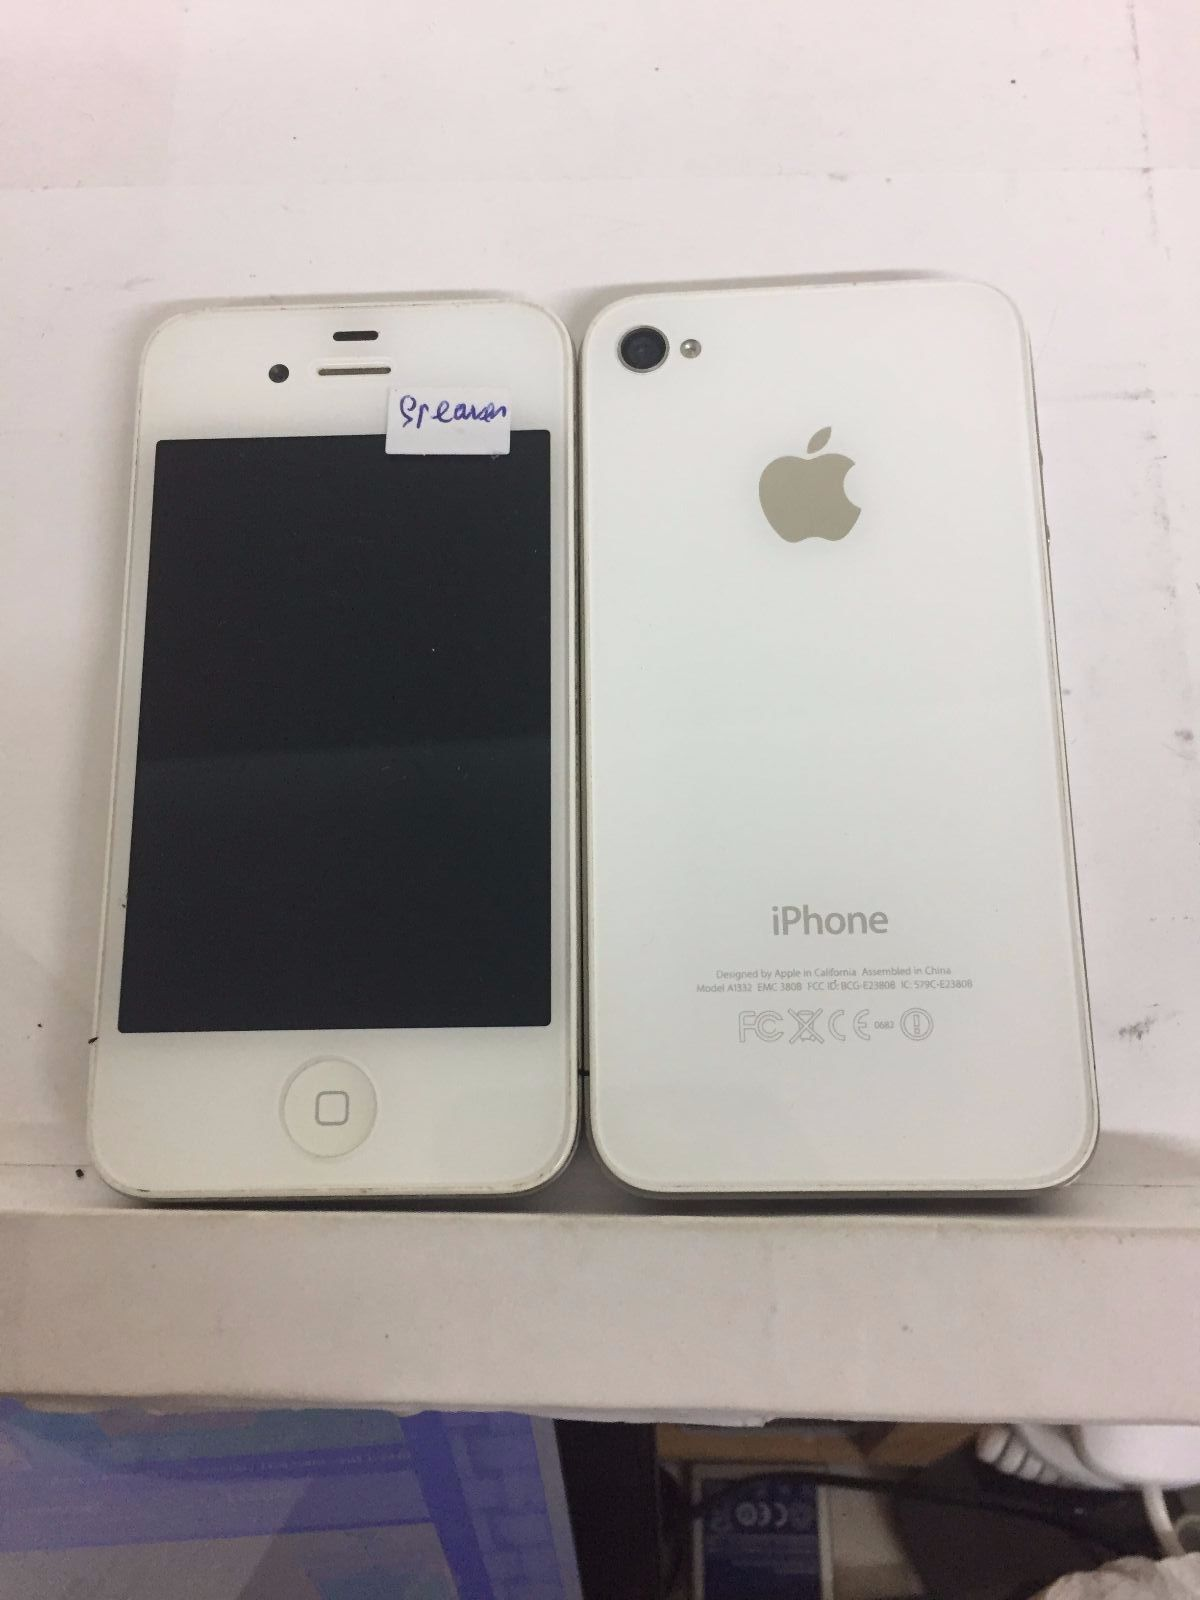 Apple iPhone 4-8 GB-WHITE(AT&T)FULLY FUNCTIONAL-BROKEN SPEAKER-GOOD CONDITION https://t.co/sWiV5lF28o https://t.co/mKVxYDfjQV